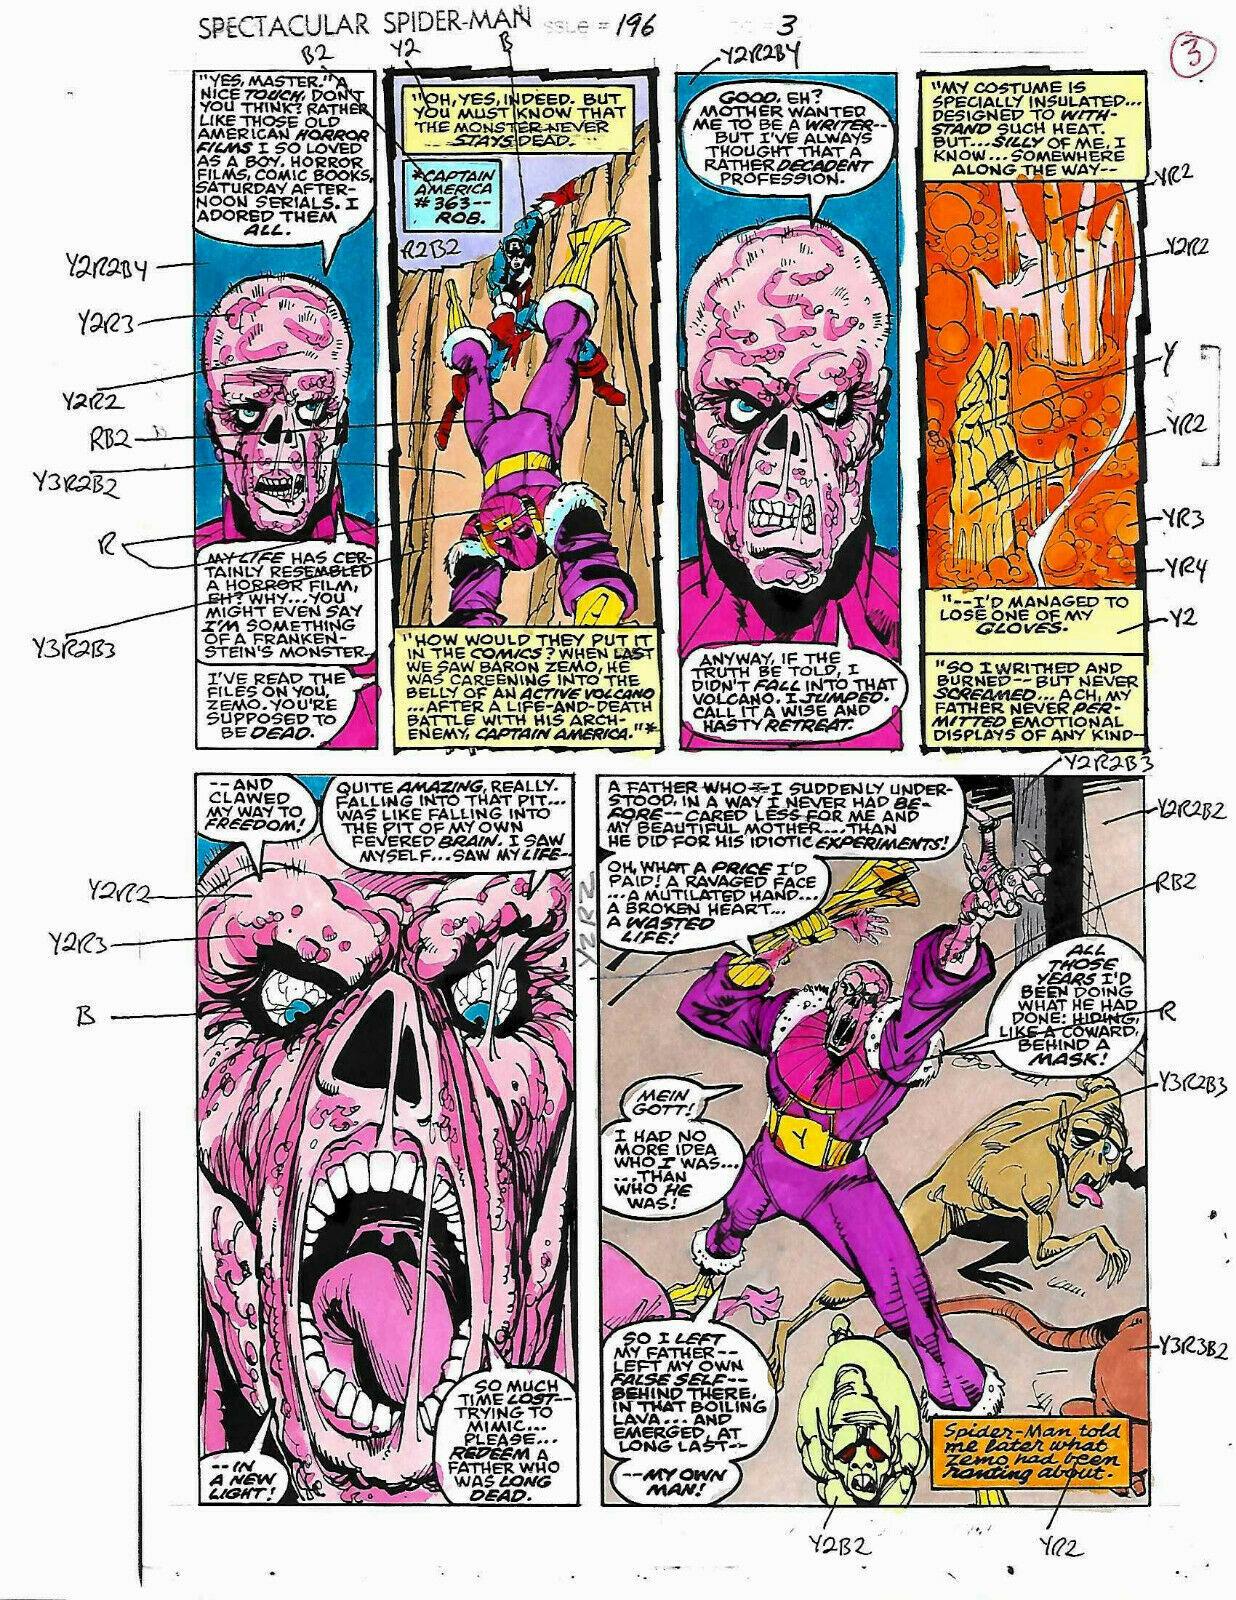 Original Spider-man Marvel color guide art: Captain America vs Zemo/Sal Buscema - $99.50